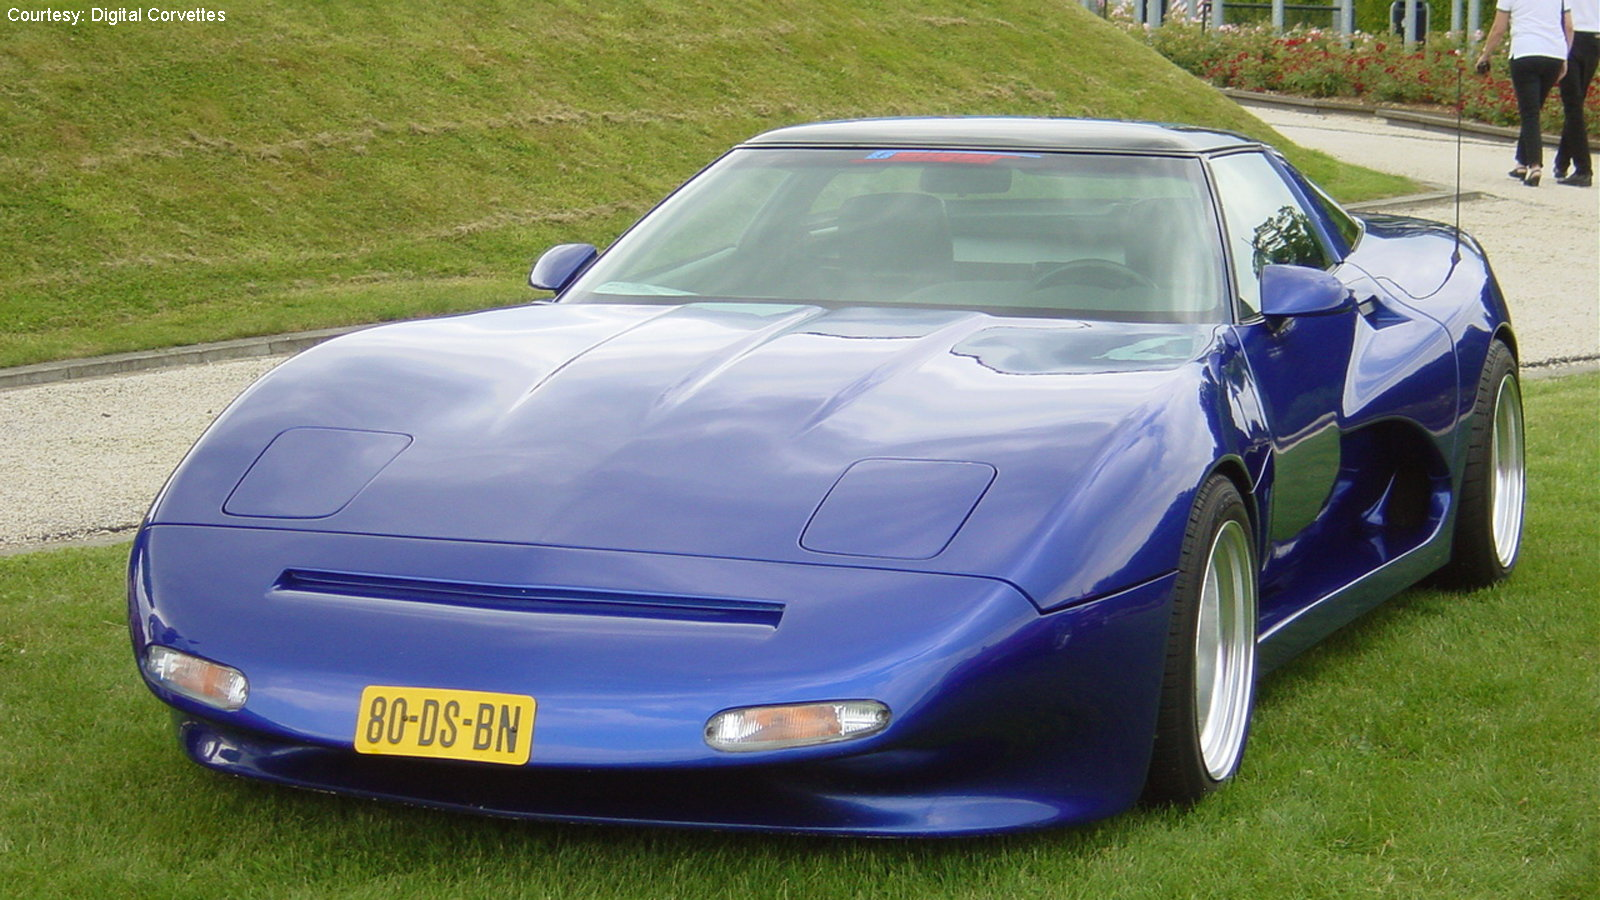 Widebody C4 Corvette to Make Things Different | Corvetteforum